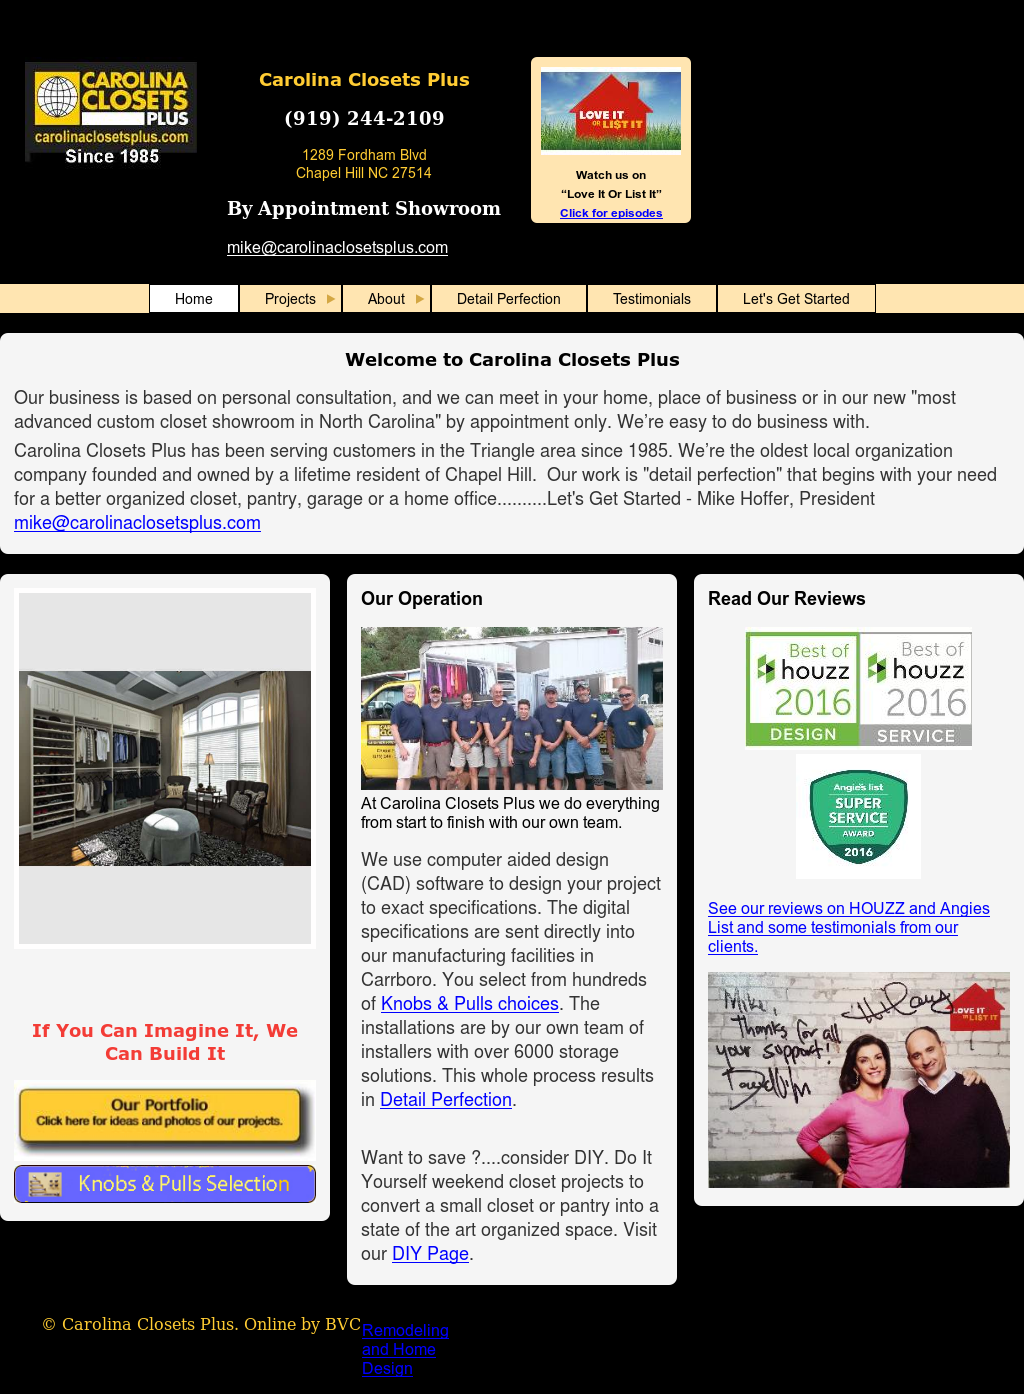 Carolina Closets Plus Website History